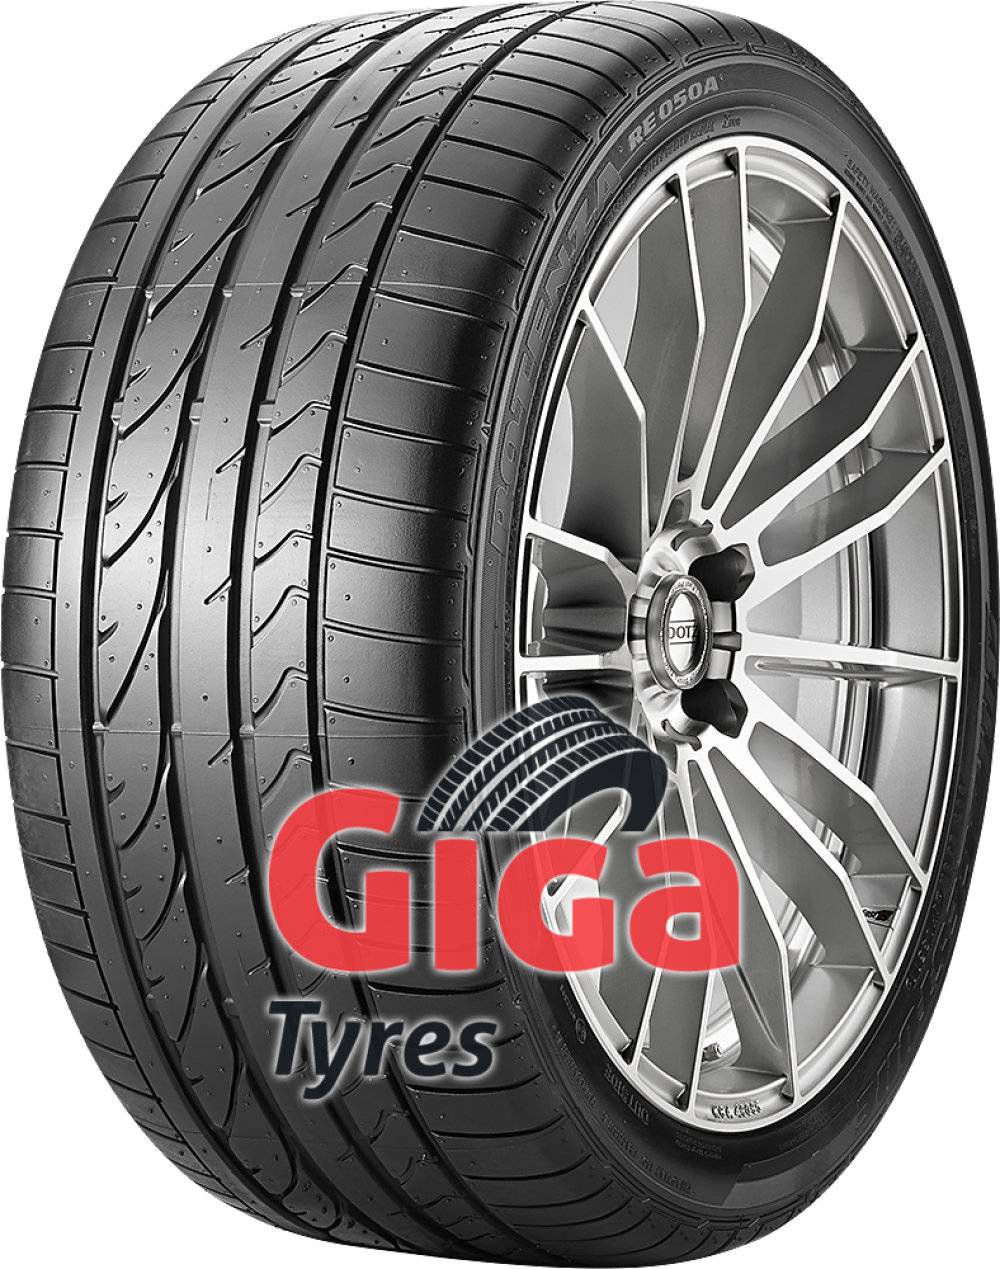 Bridgestone Potenza RE 050 A Ecopia ( 245/45 R18 96W with rim protection (MFS) )